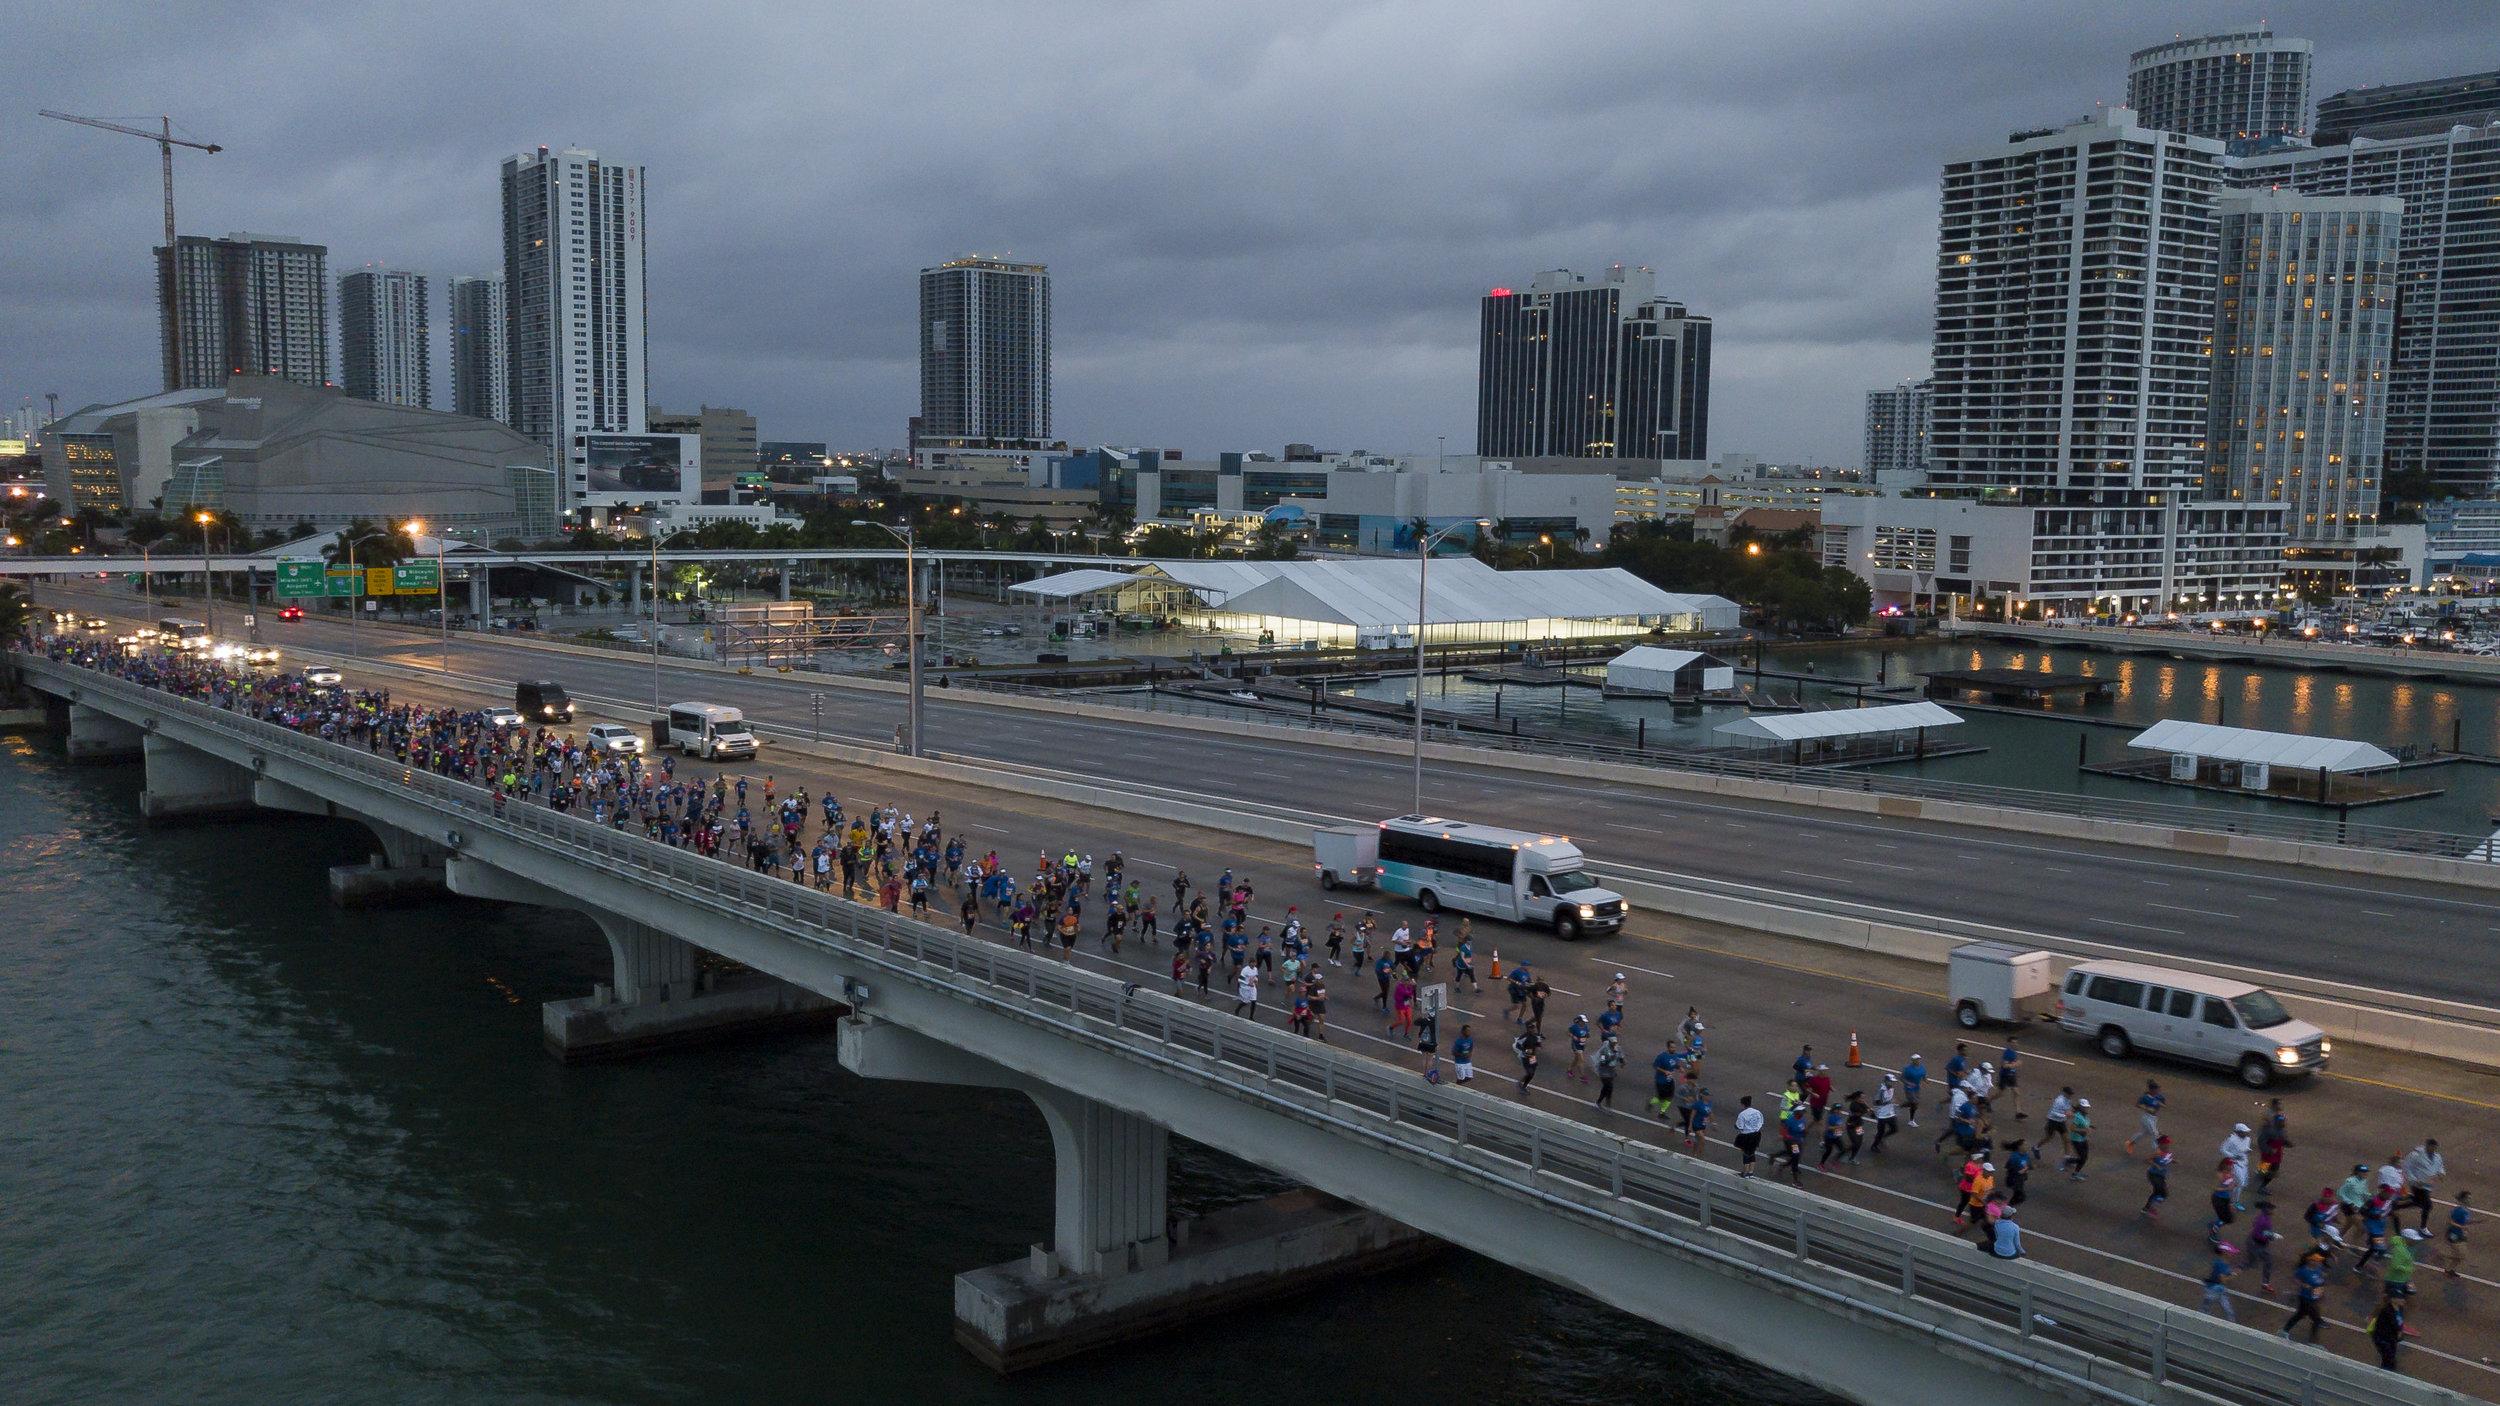 Runners make their way across the MacArthur Causeway toward Watson Island during the Miami Marathon & Half Marathon on Sunday, Jan. 27, 2019.